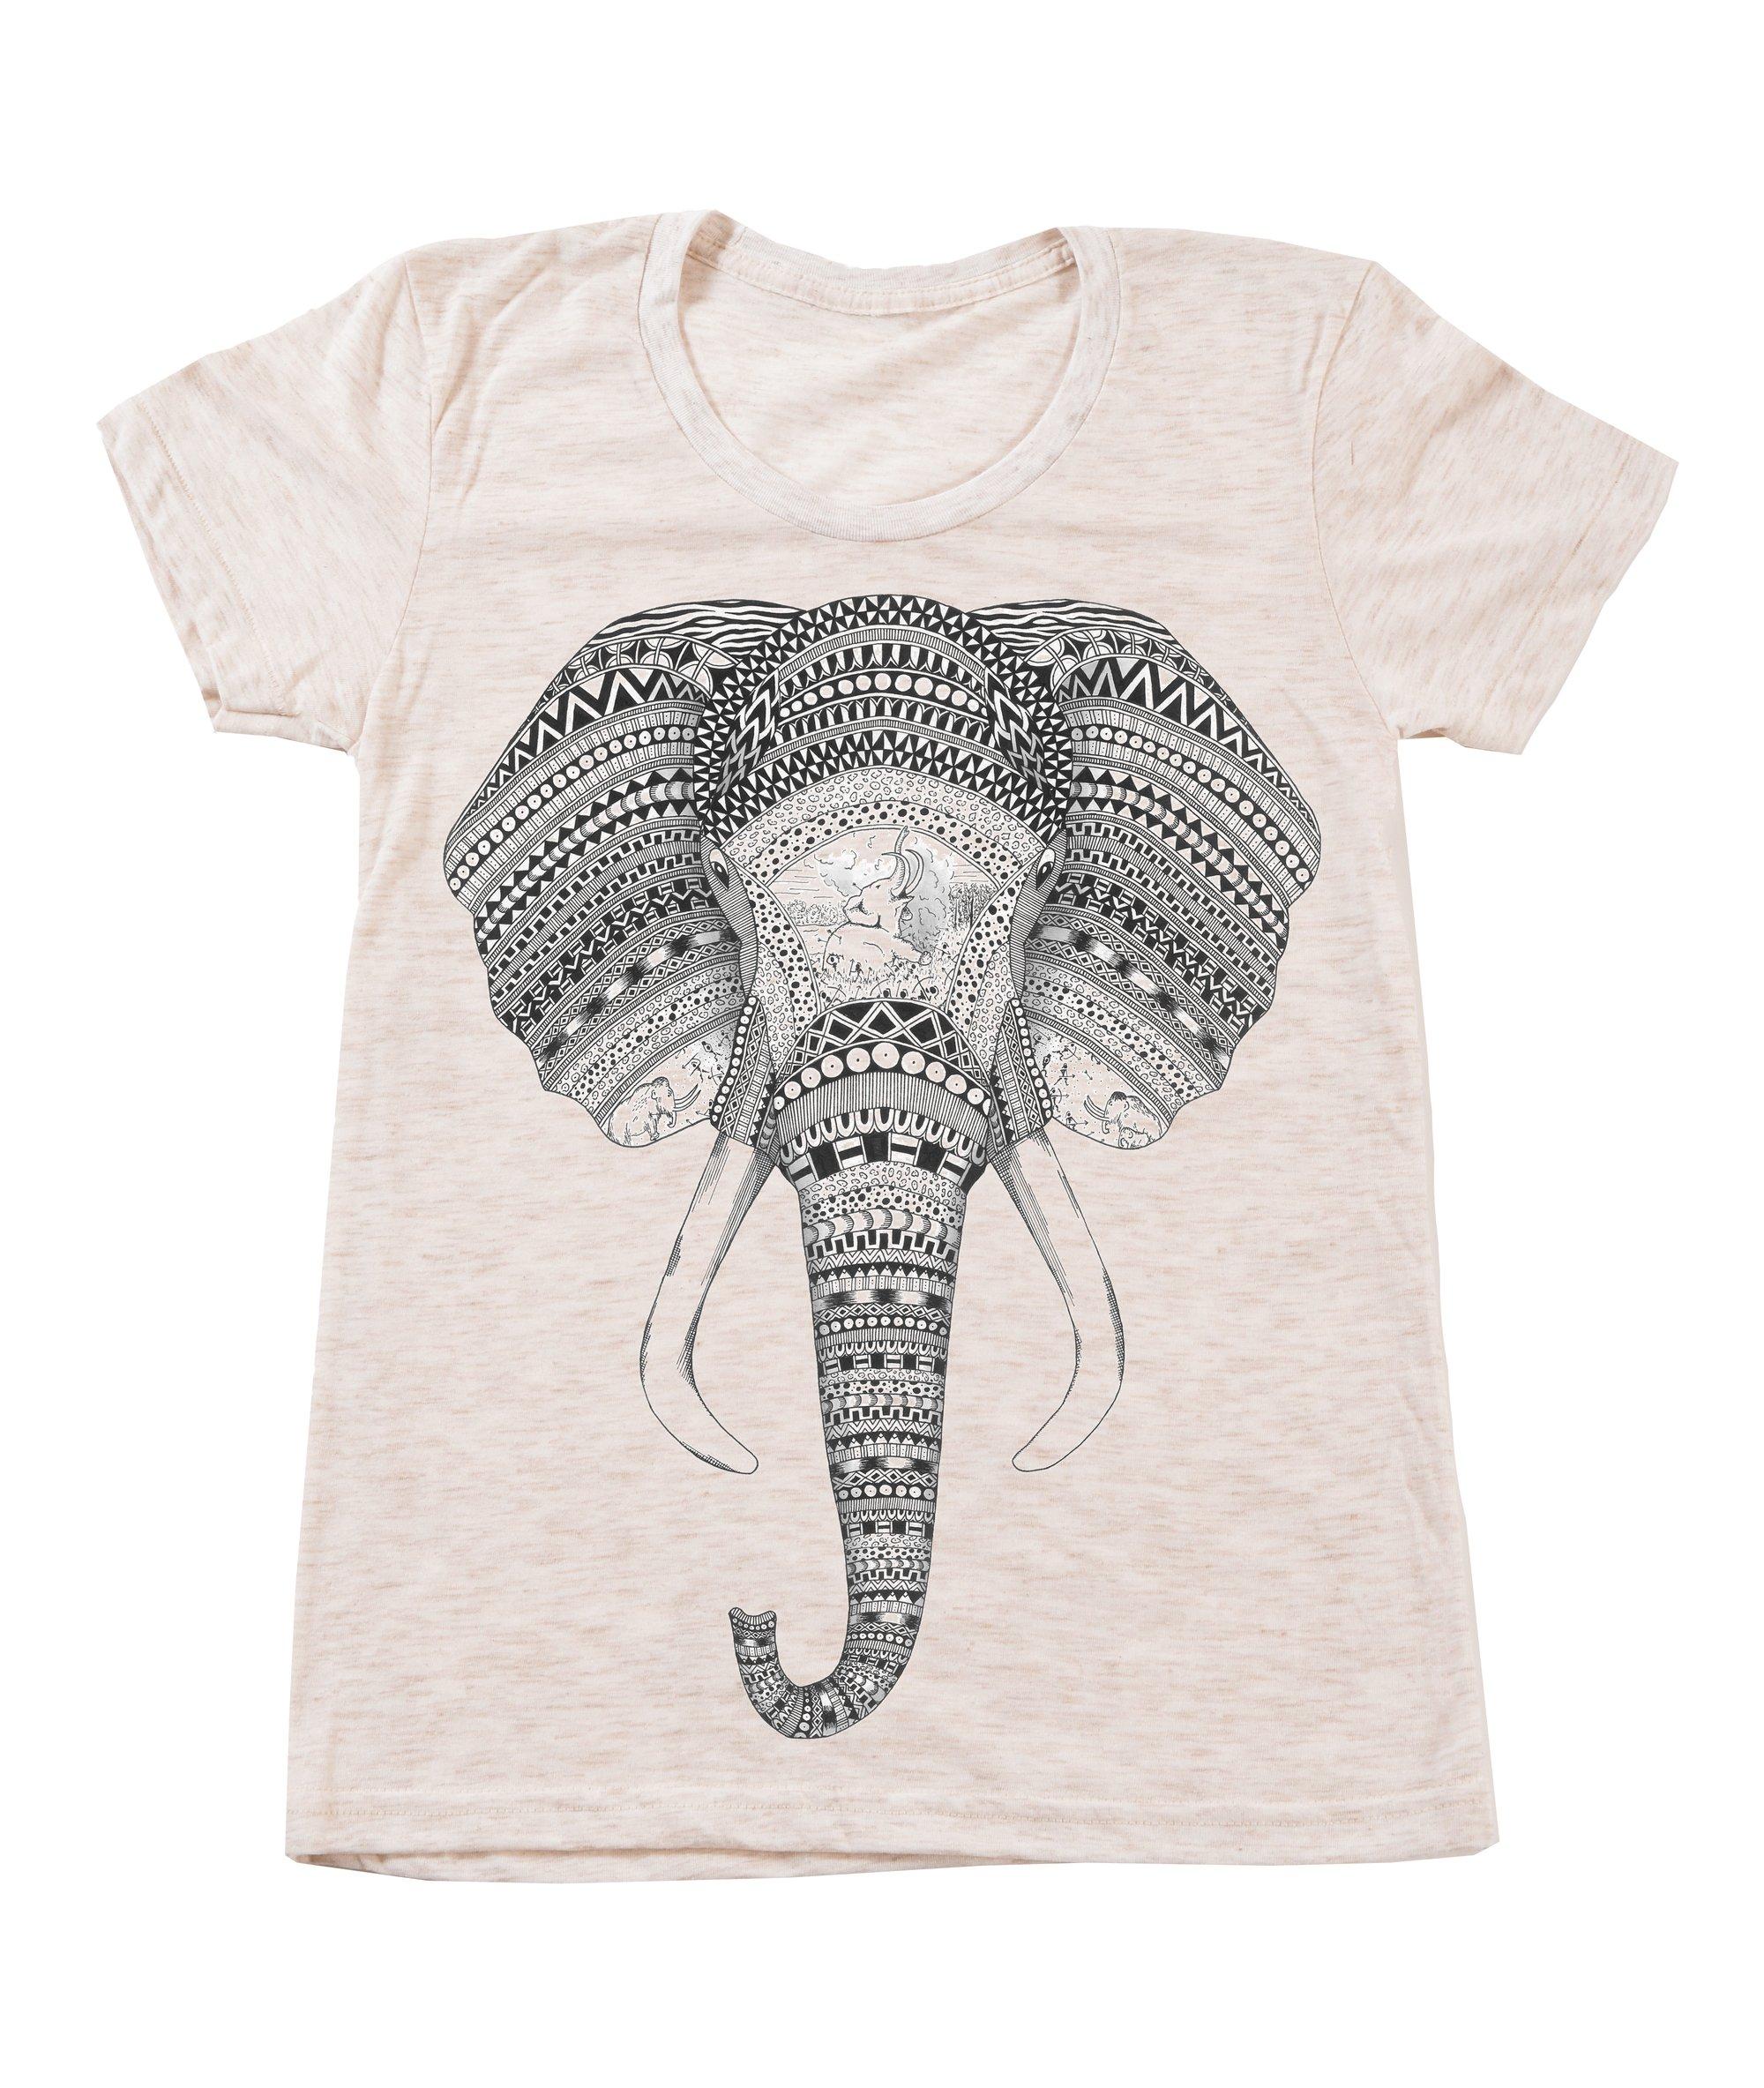 2fcef46f2e3d34 Image of Ladies Elephant Tee